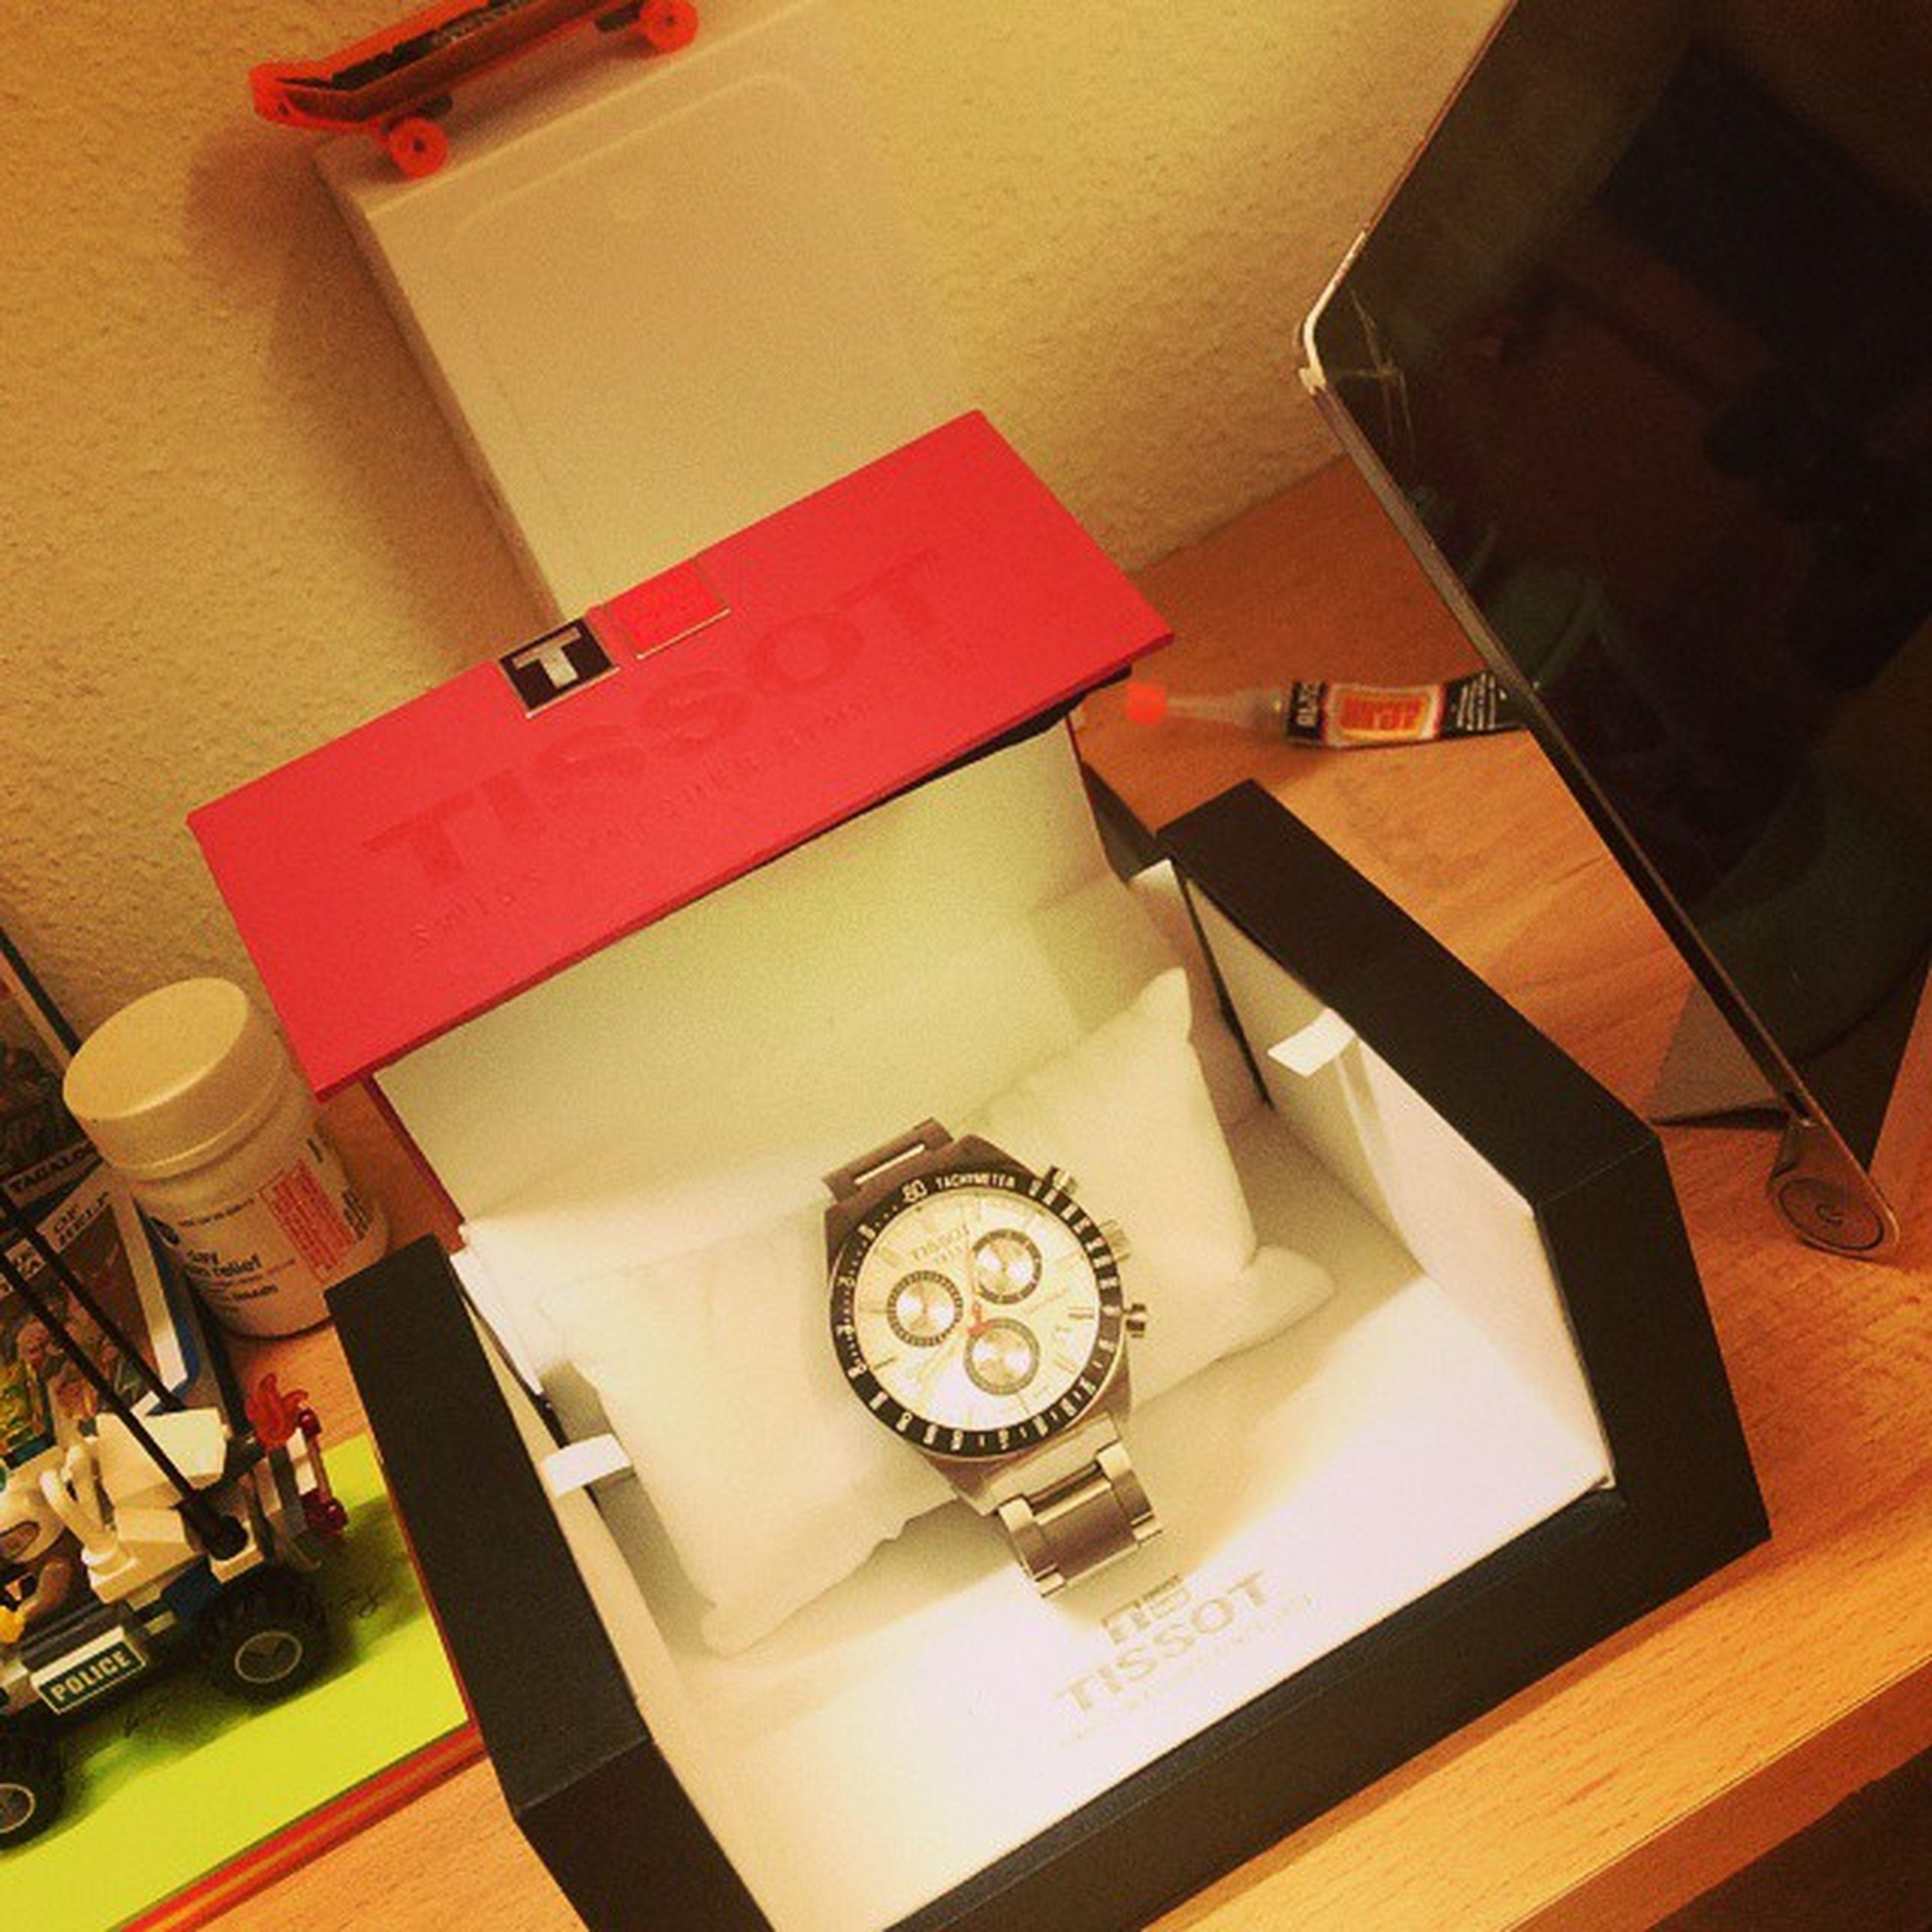 Life is short! Buy the watch! Needsvswants Watchenthusiasts Realwatchesforrealpeople DontCrackUnderPressure Swiss Tissot